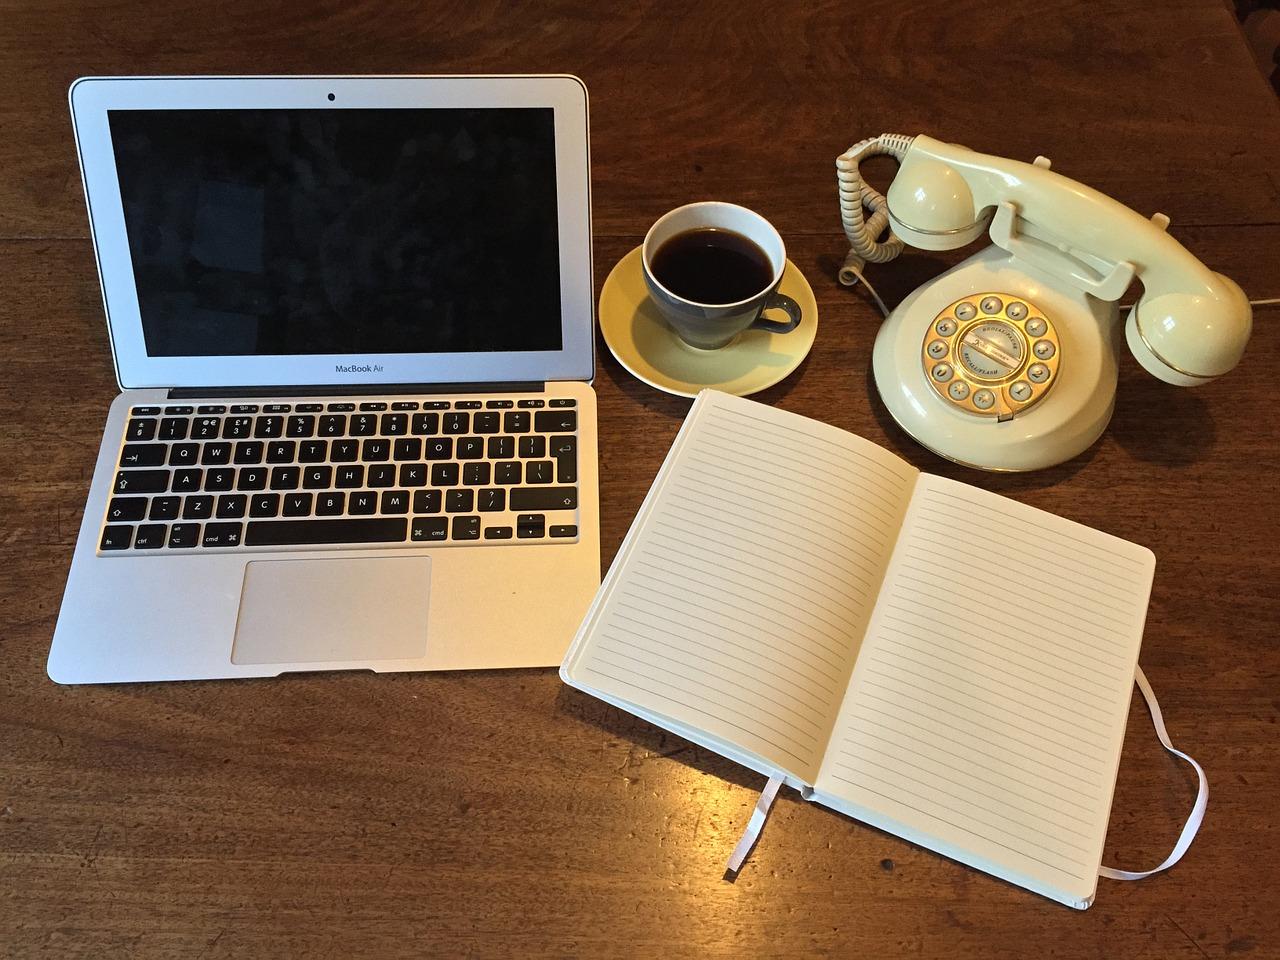 Laptop,old telephone,phone,vintage,notebook - free photo